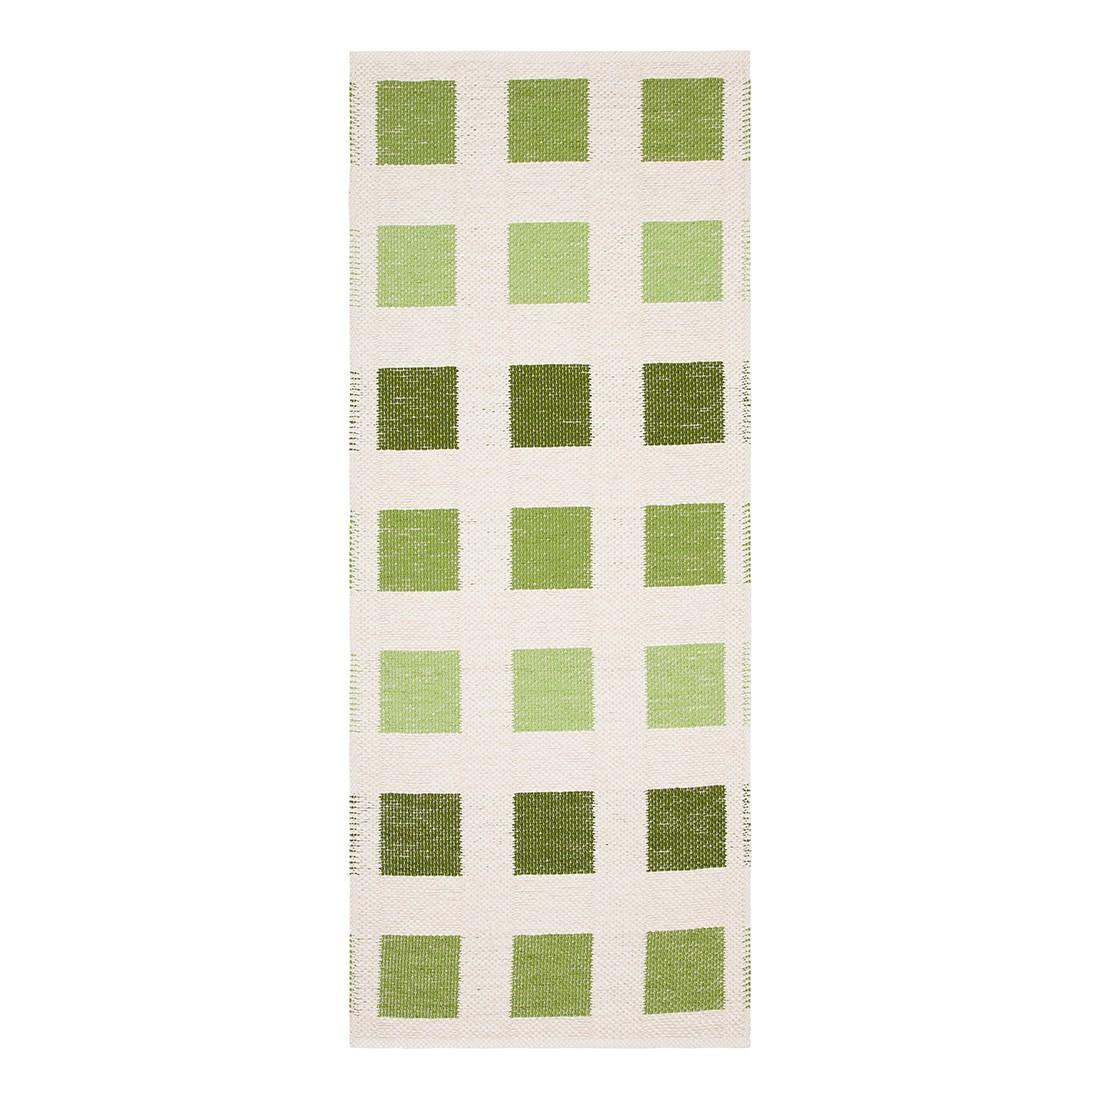 tapis cubo fibre synth tique verte blanc cr me 60 x 150 cm. Black Bedroom Furniture Sets. Home Design Ideas